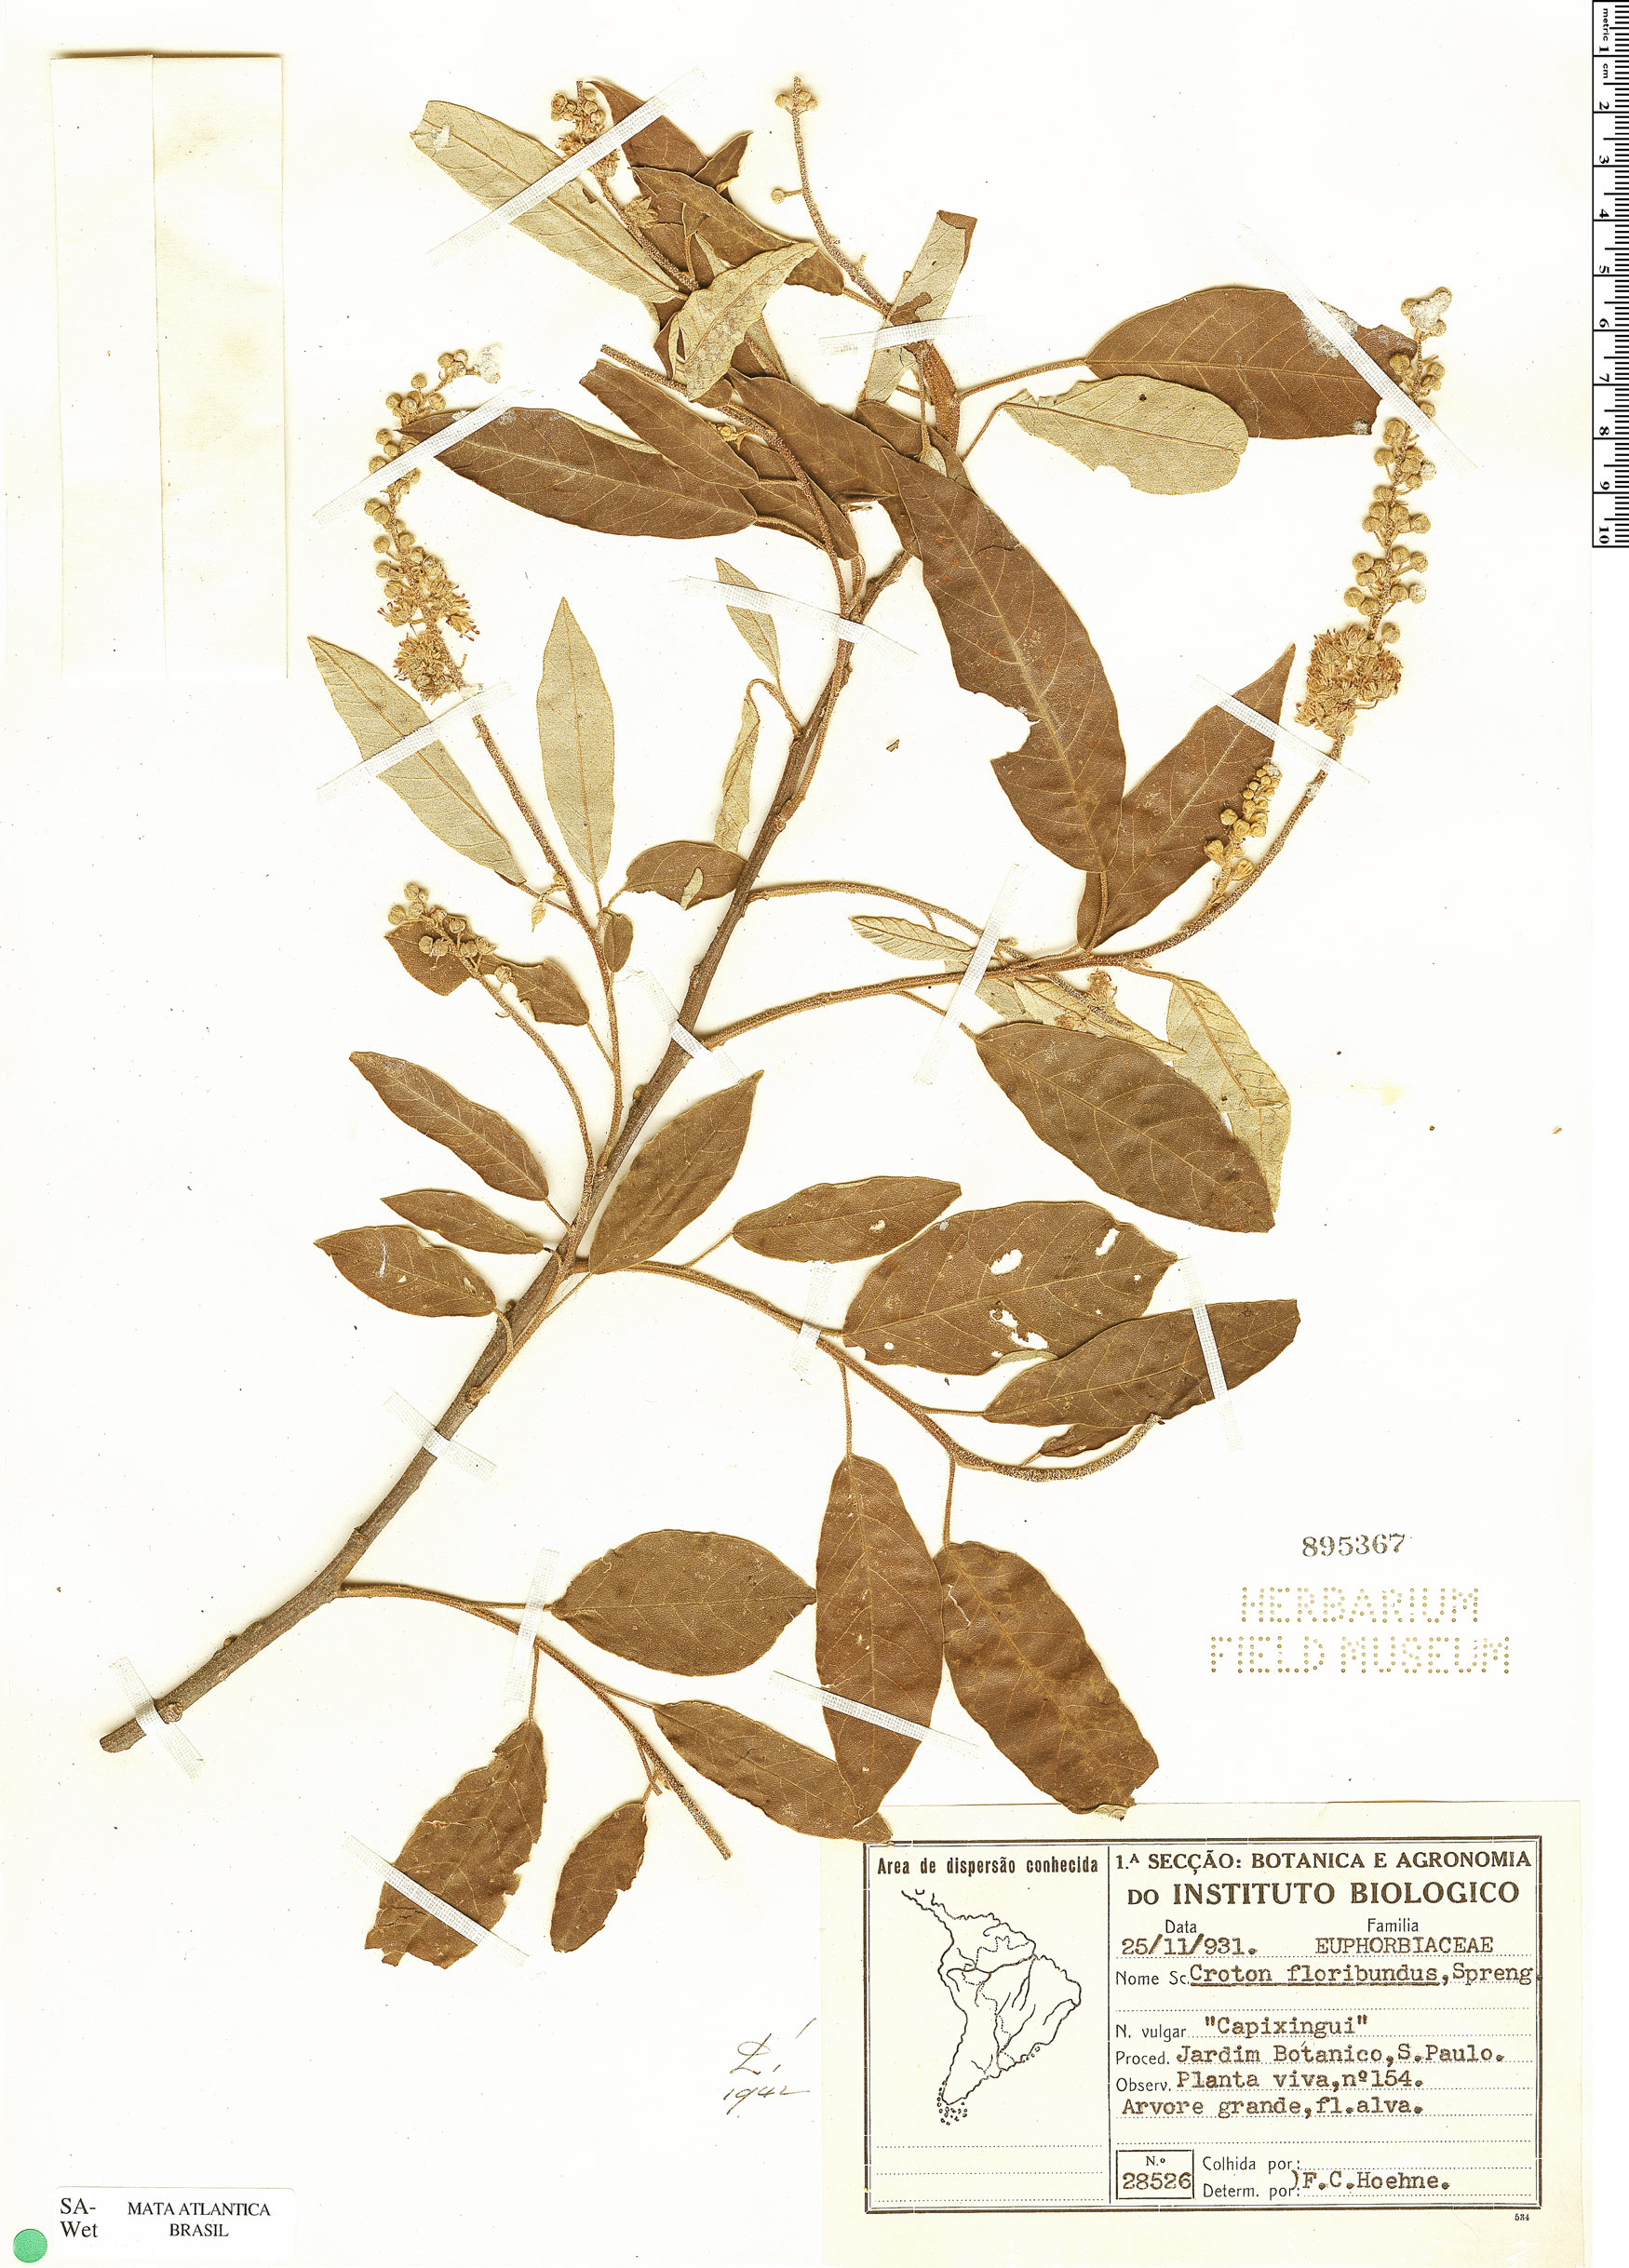 Specimen: Croton floribundus